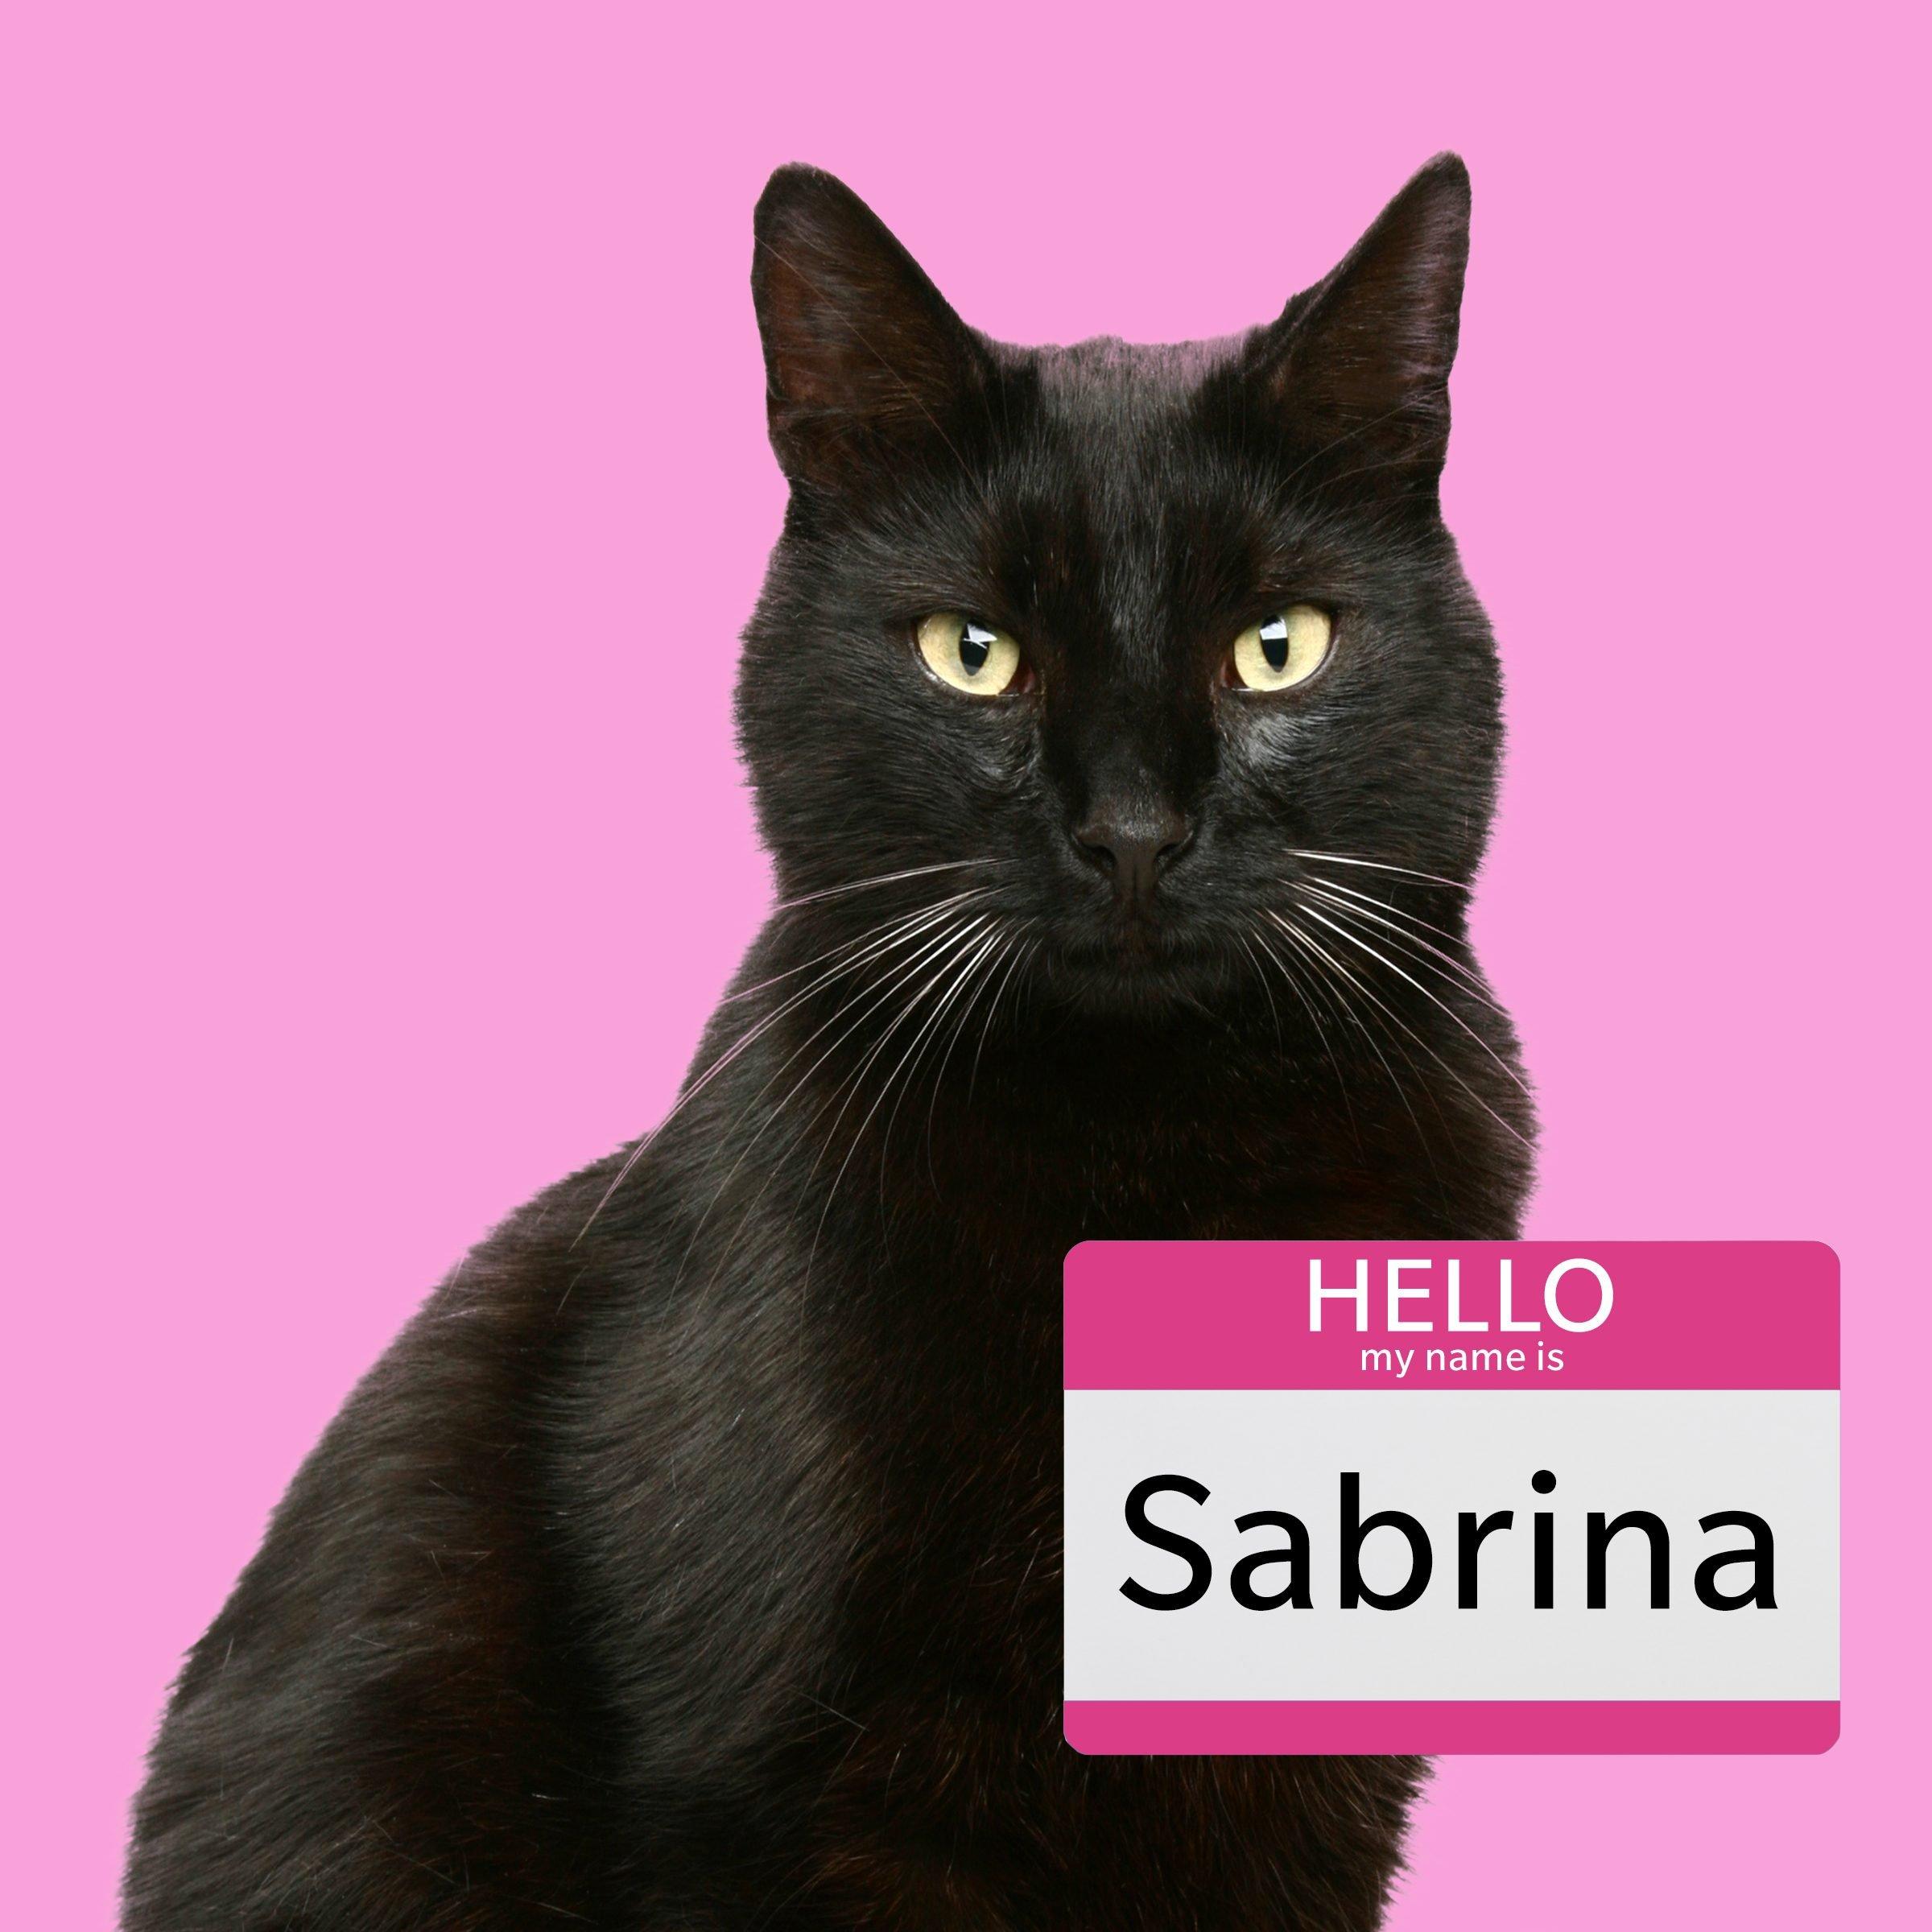 Sabrina, a girl cat name for a black cat